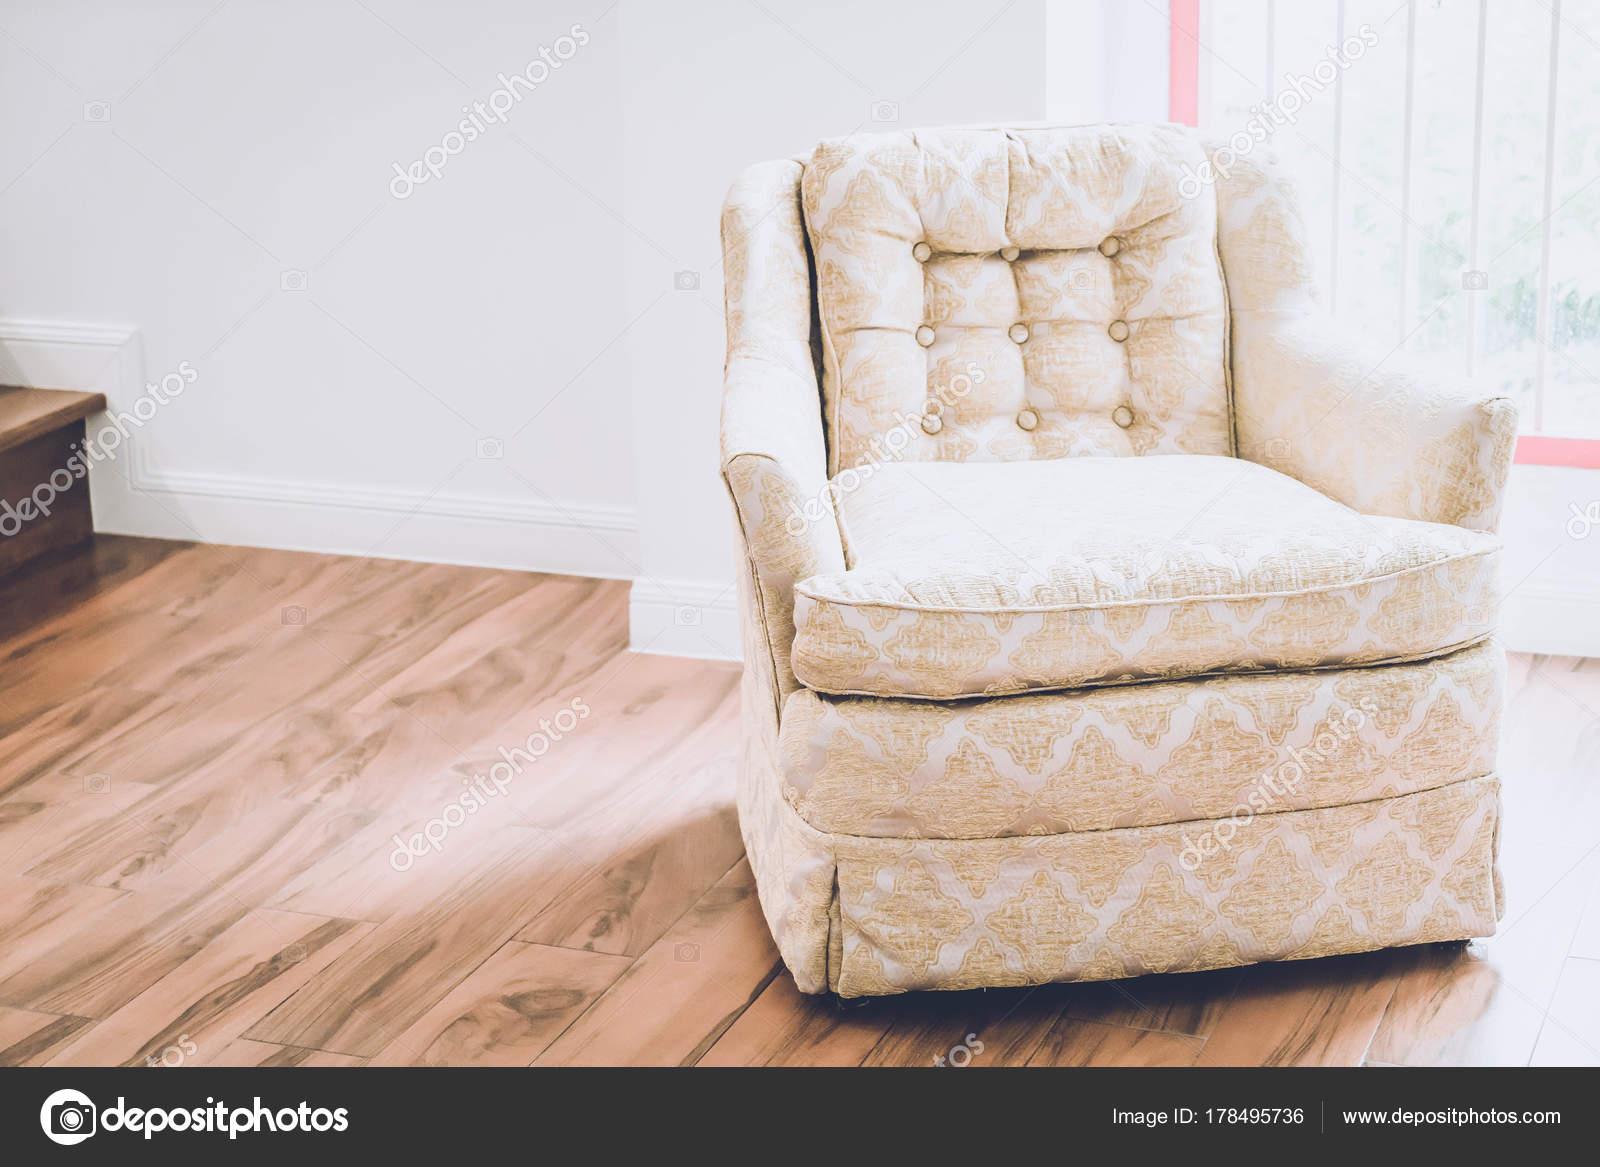 Oude fauteuil decoratie in huis u2014 stockfoto © topntp #178495736